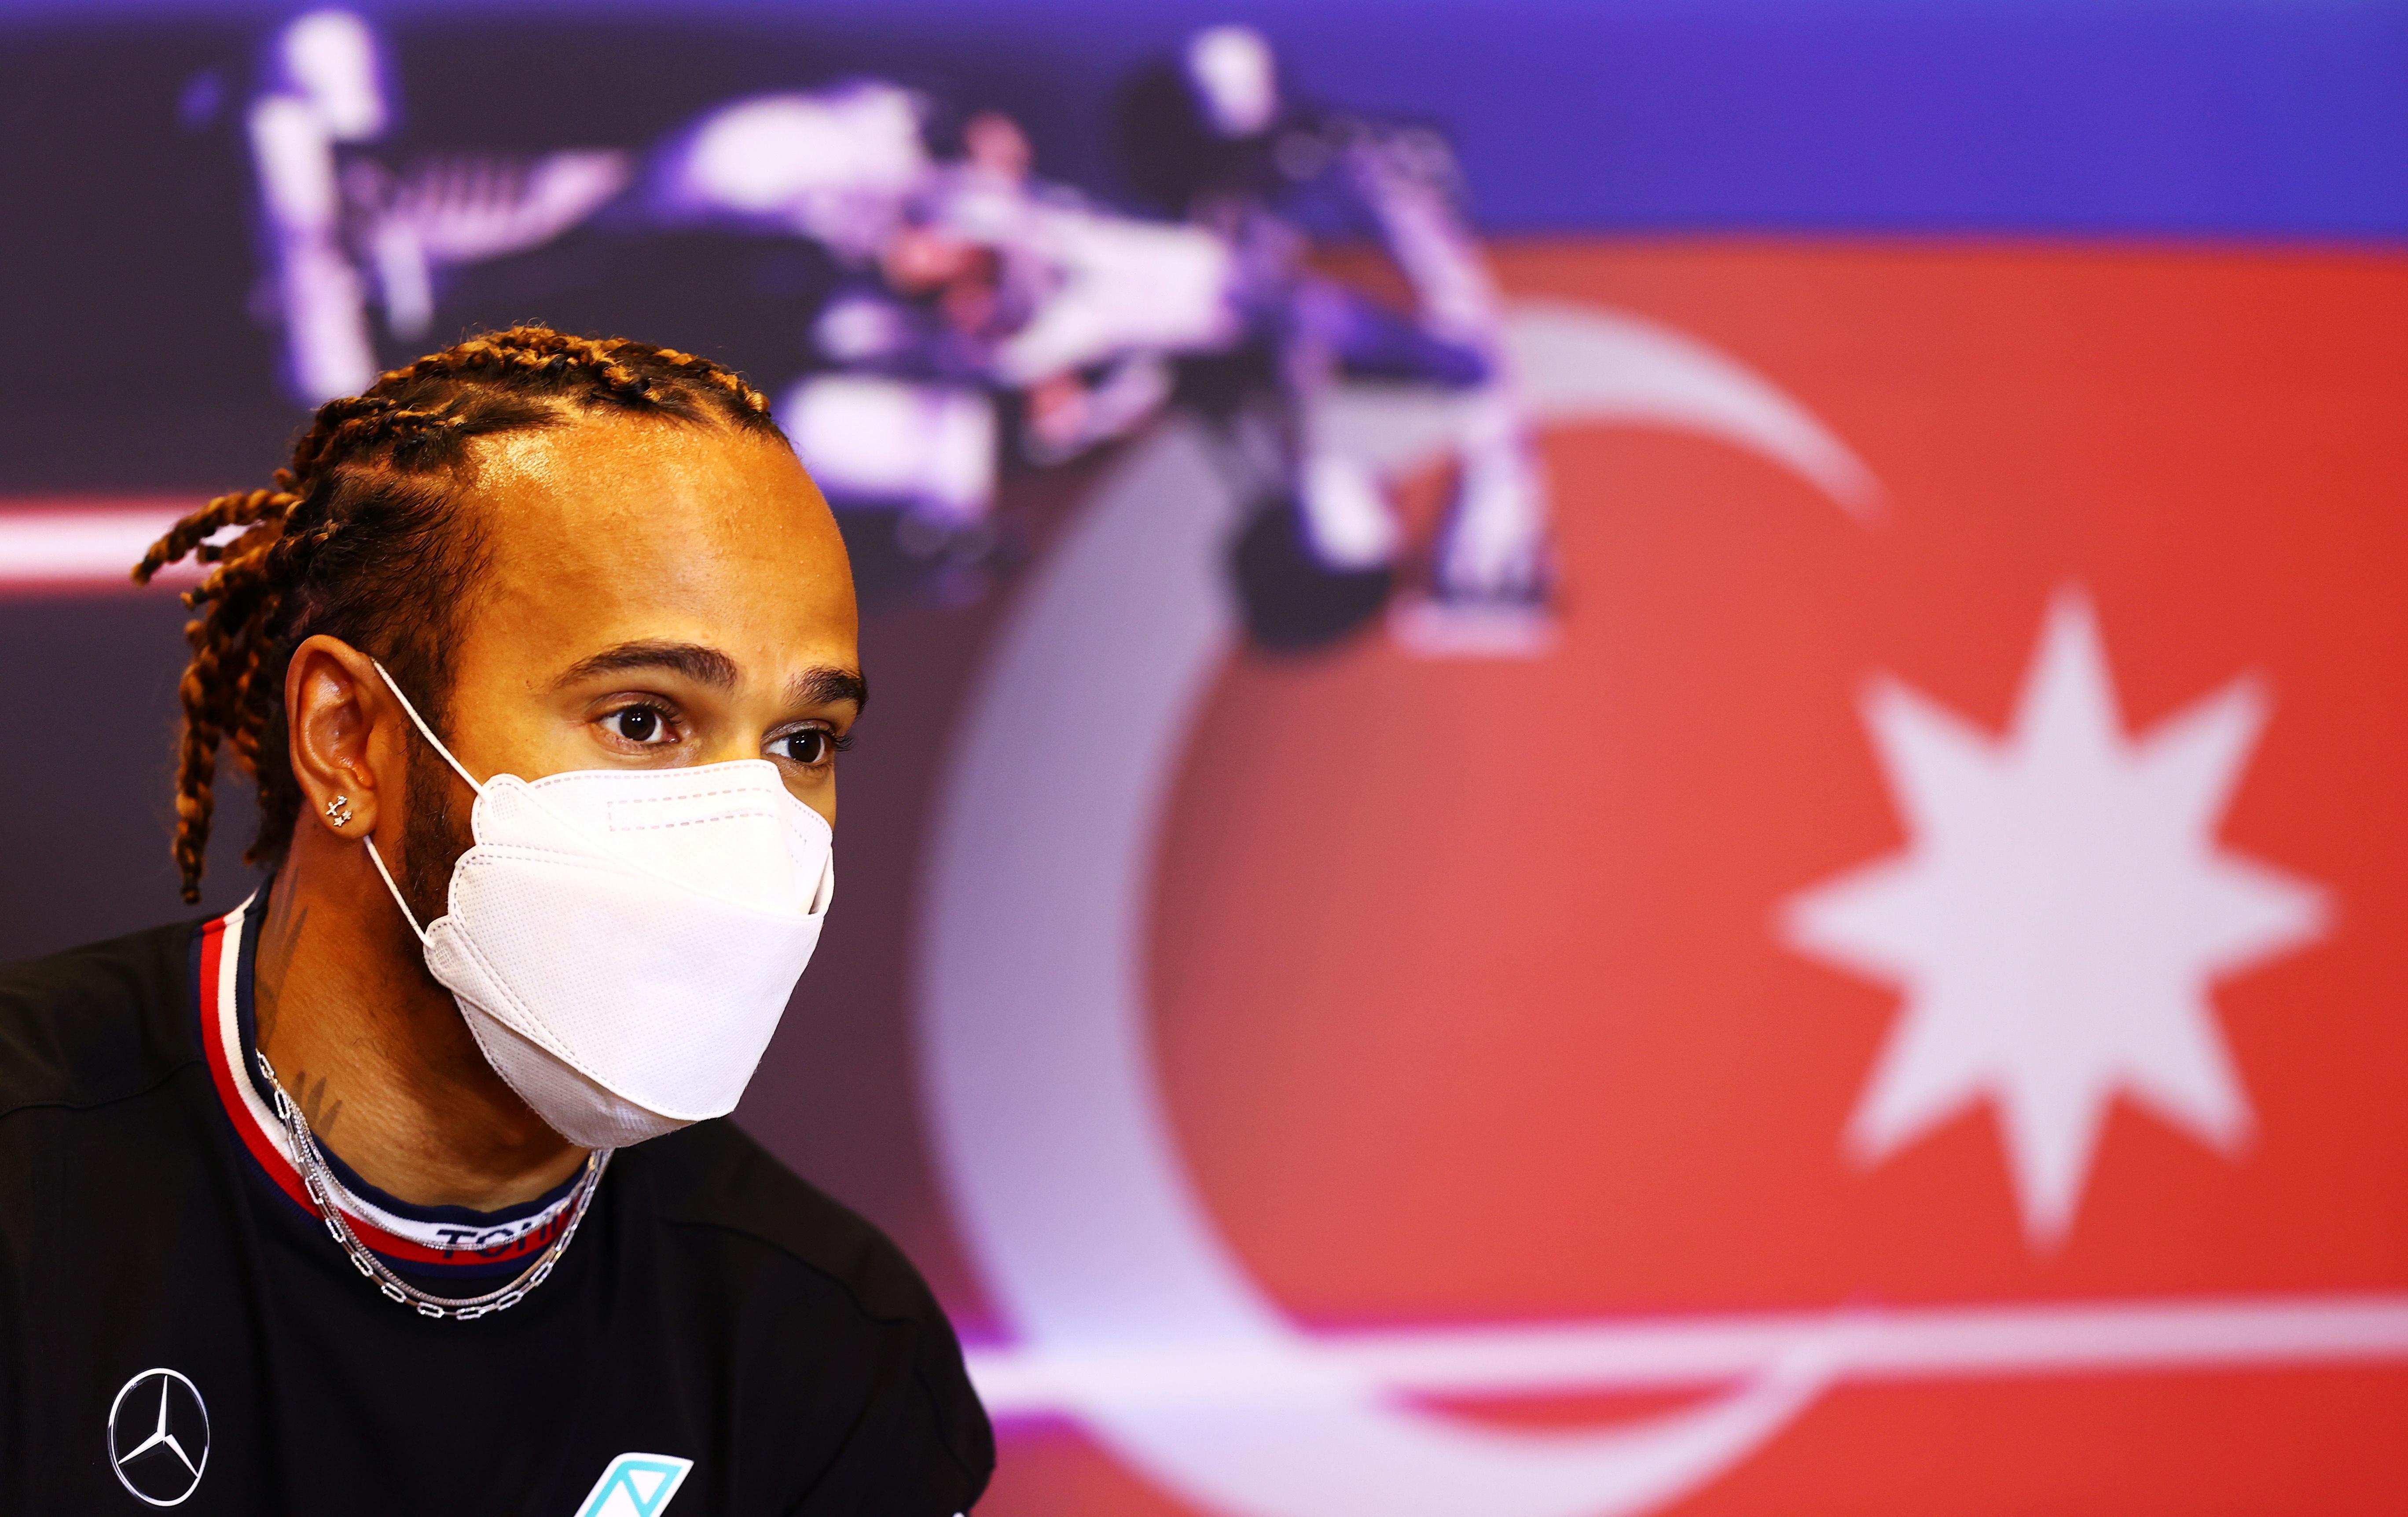 Formula One F1 - Formula One - Azerbaijan Grand Prix - Baku City Circuit, Baku, Azerbaijan - June 3, 2021 Mercedes' Lewis Hamilton during the press conference Pool via REUTERS/Francois Nel